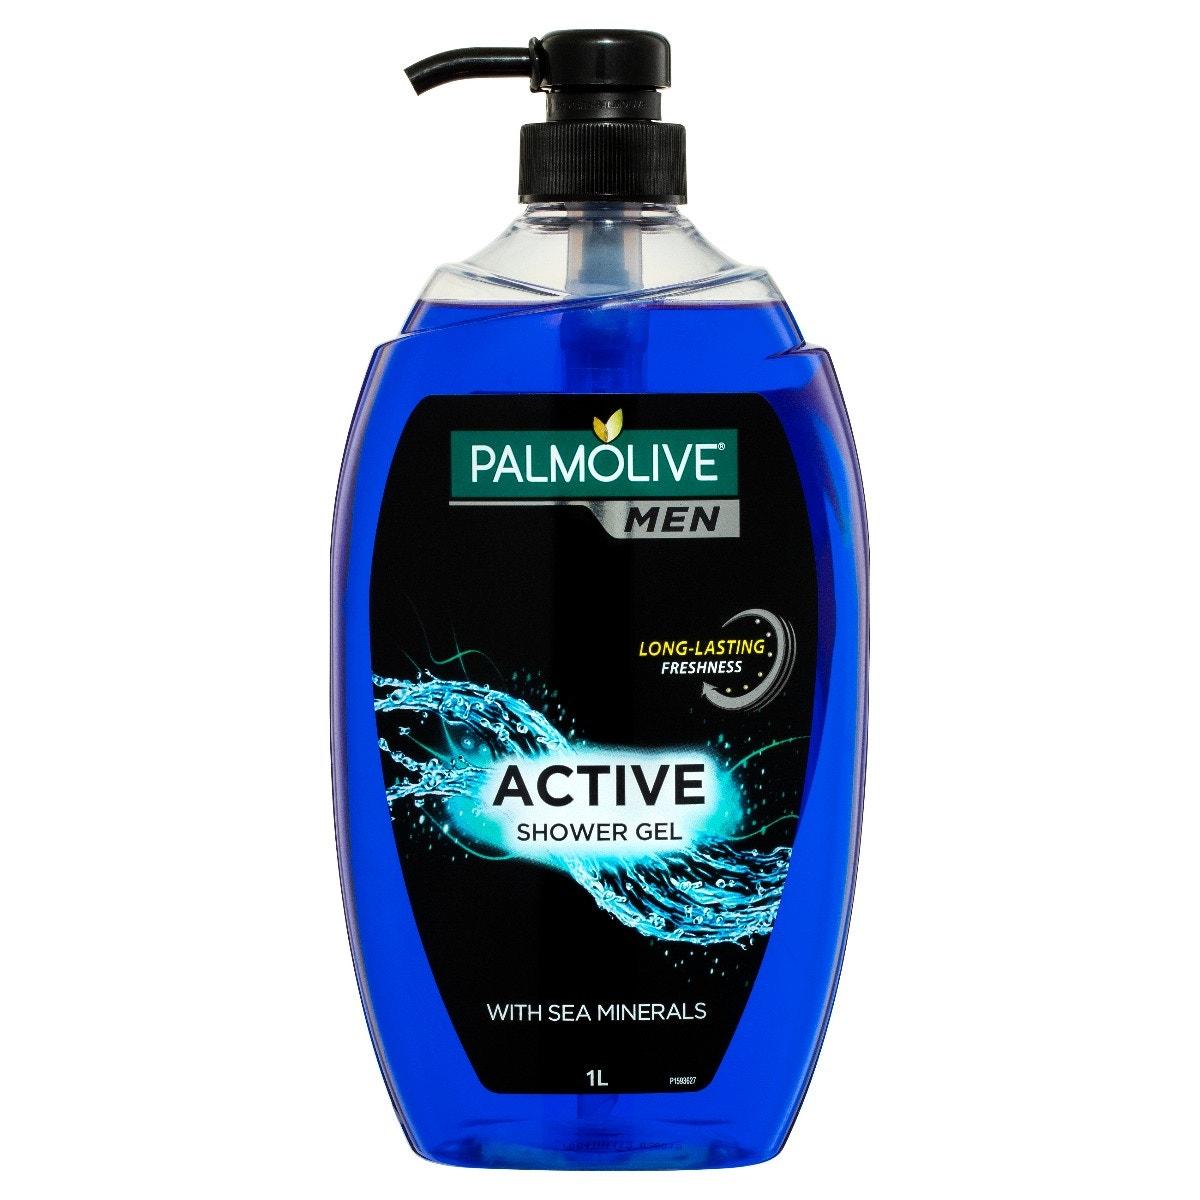 Shower Gel Chemist Direct Dove Aqua Moisture Body Wash Refill 400ml Twin Pack